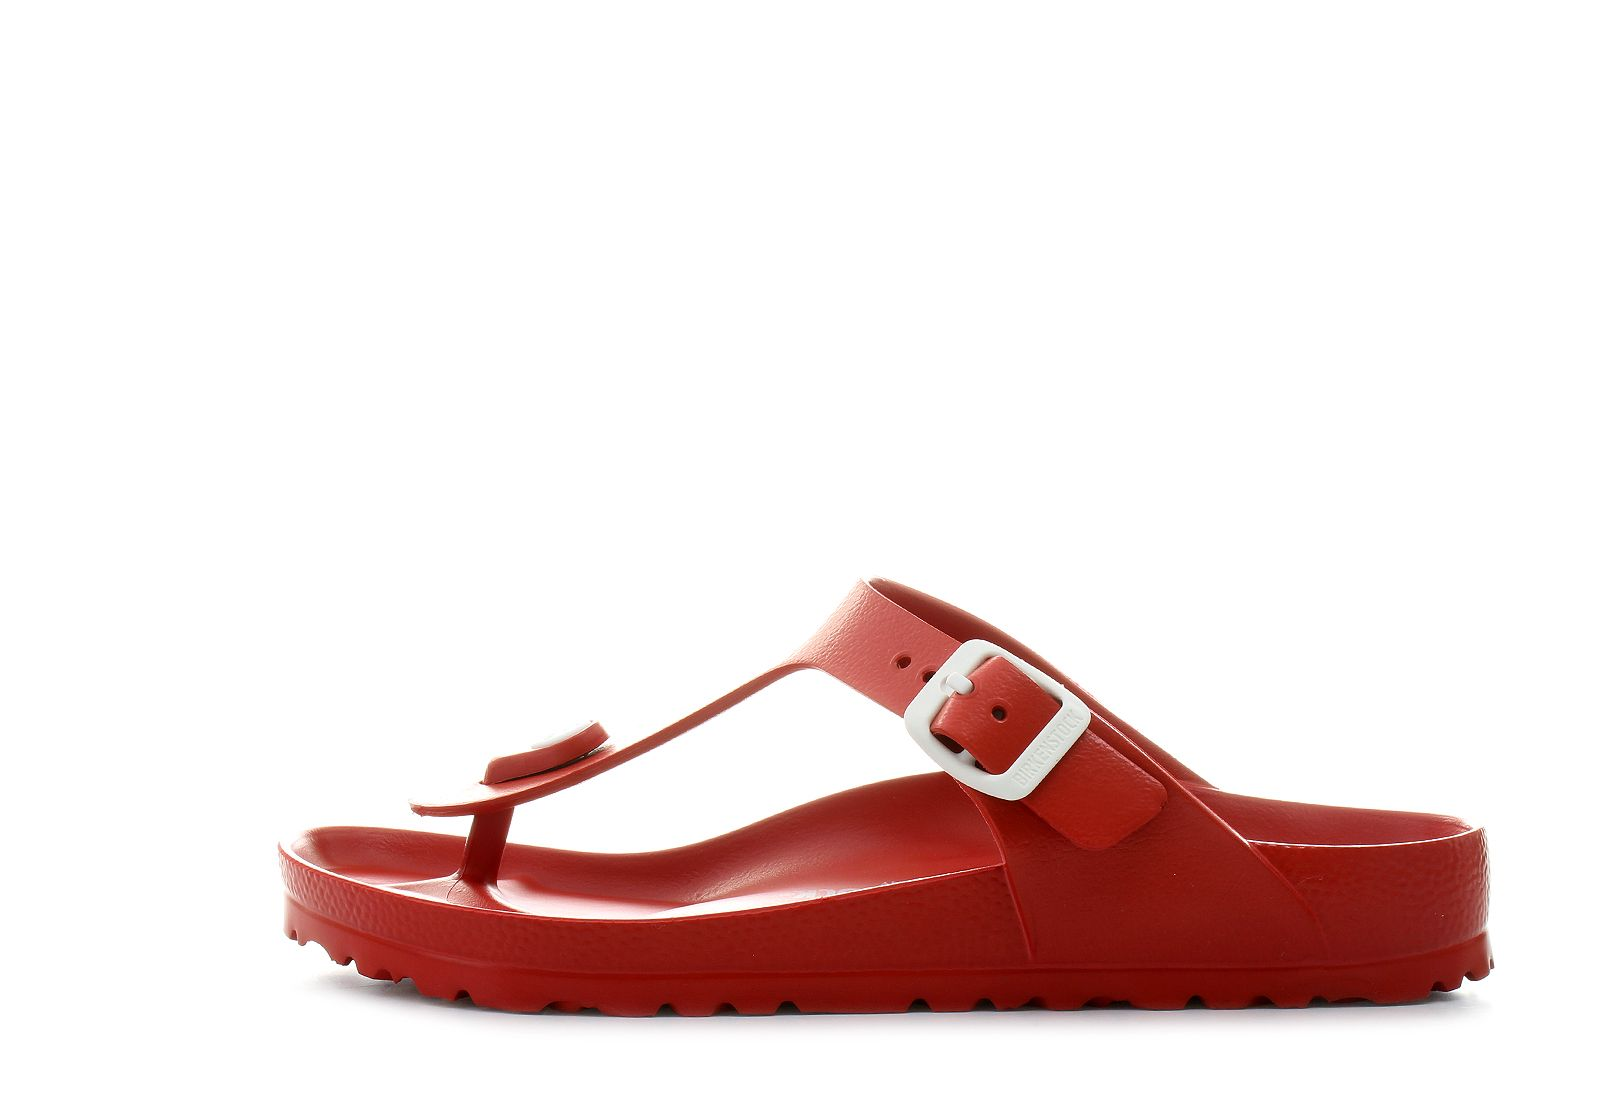 9ab5151c58d Birkenstock Slippers - Gizeh Eva - 128231-red - Online shop for ...